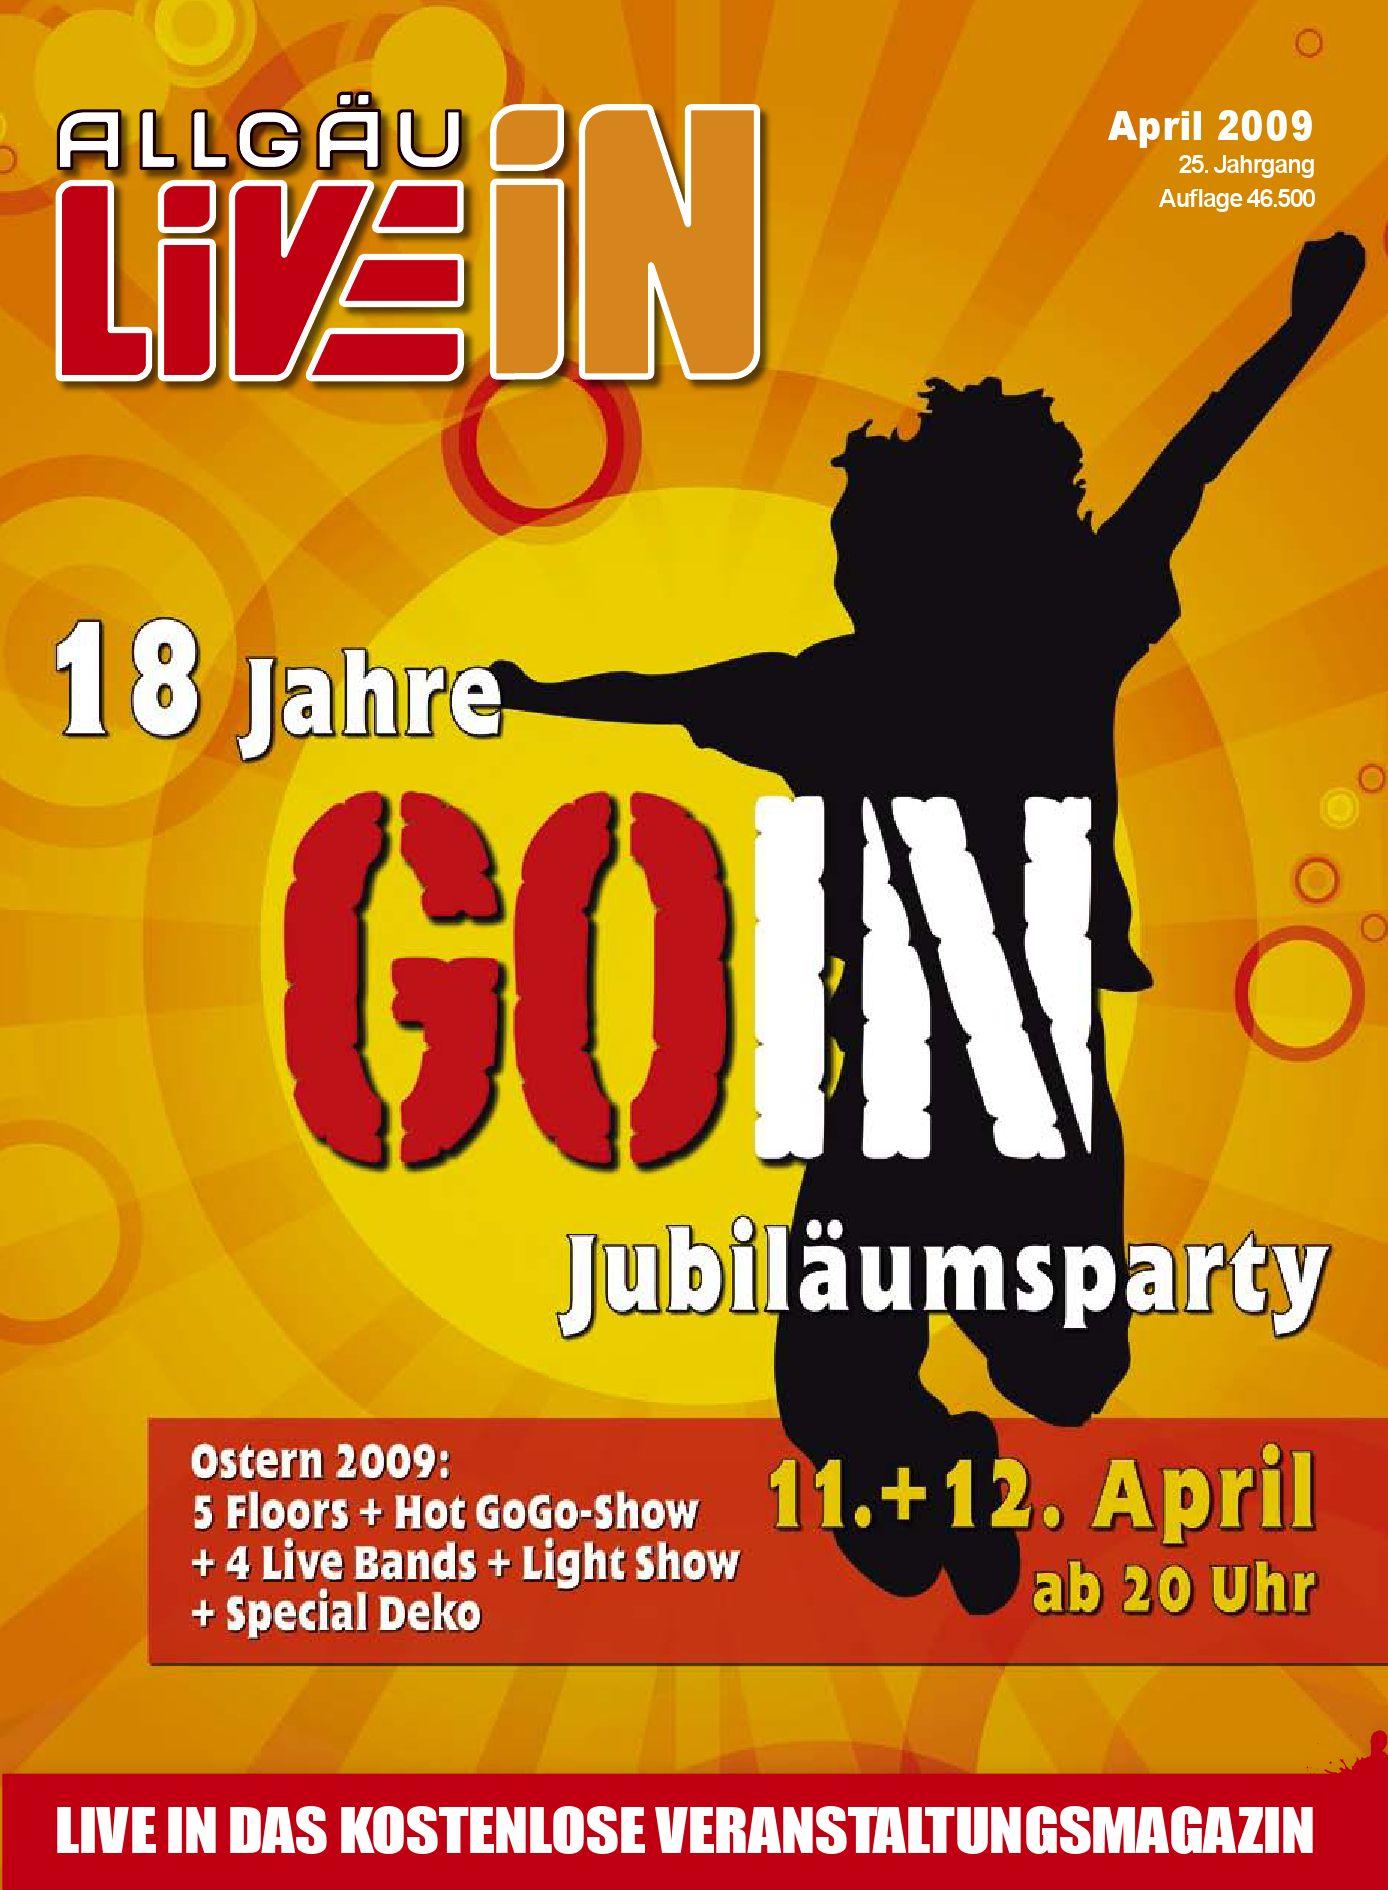 Allgäu Live In (04.2009) By Live In Verlag - Issuu avec Musique Cirque Mp3